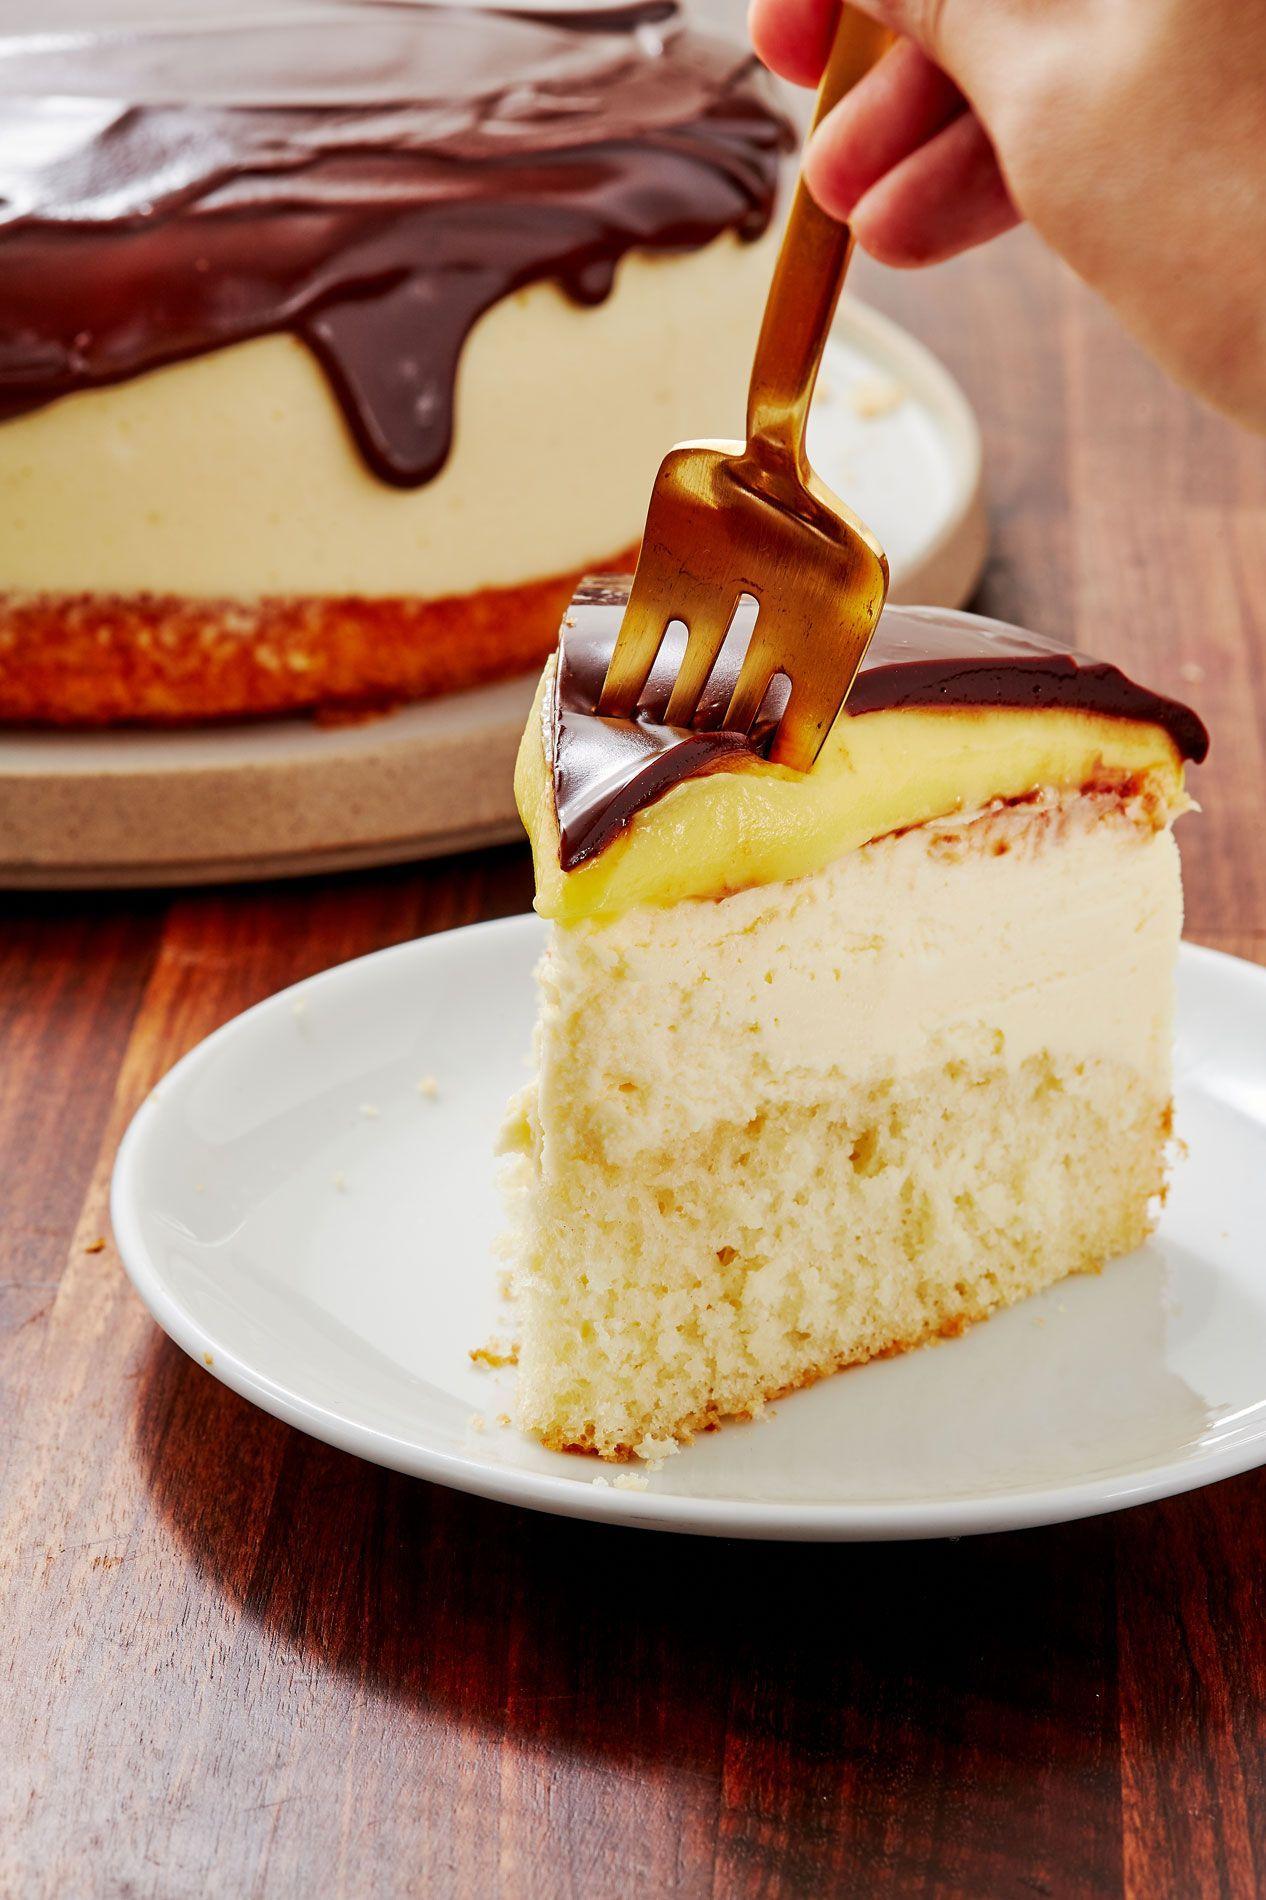 Boston cream cheesecake recipe cheesecake recipes